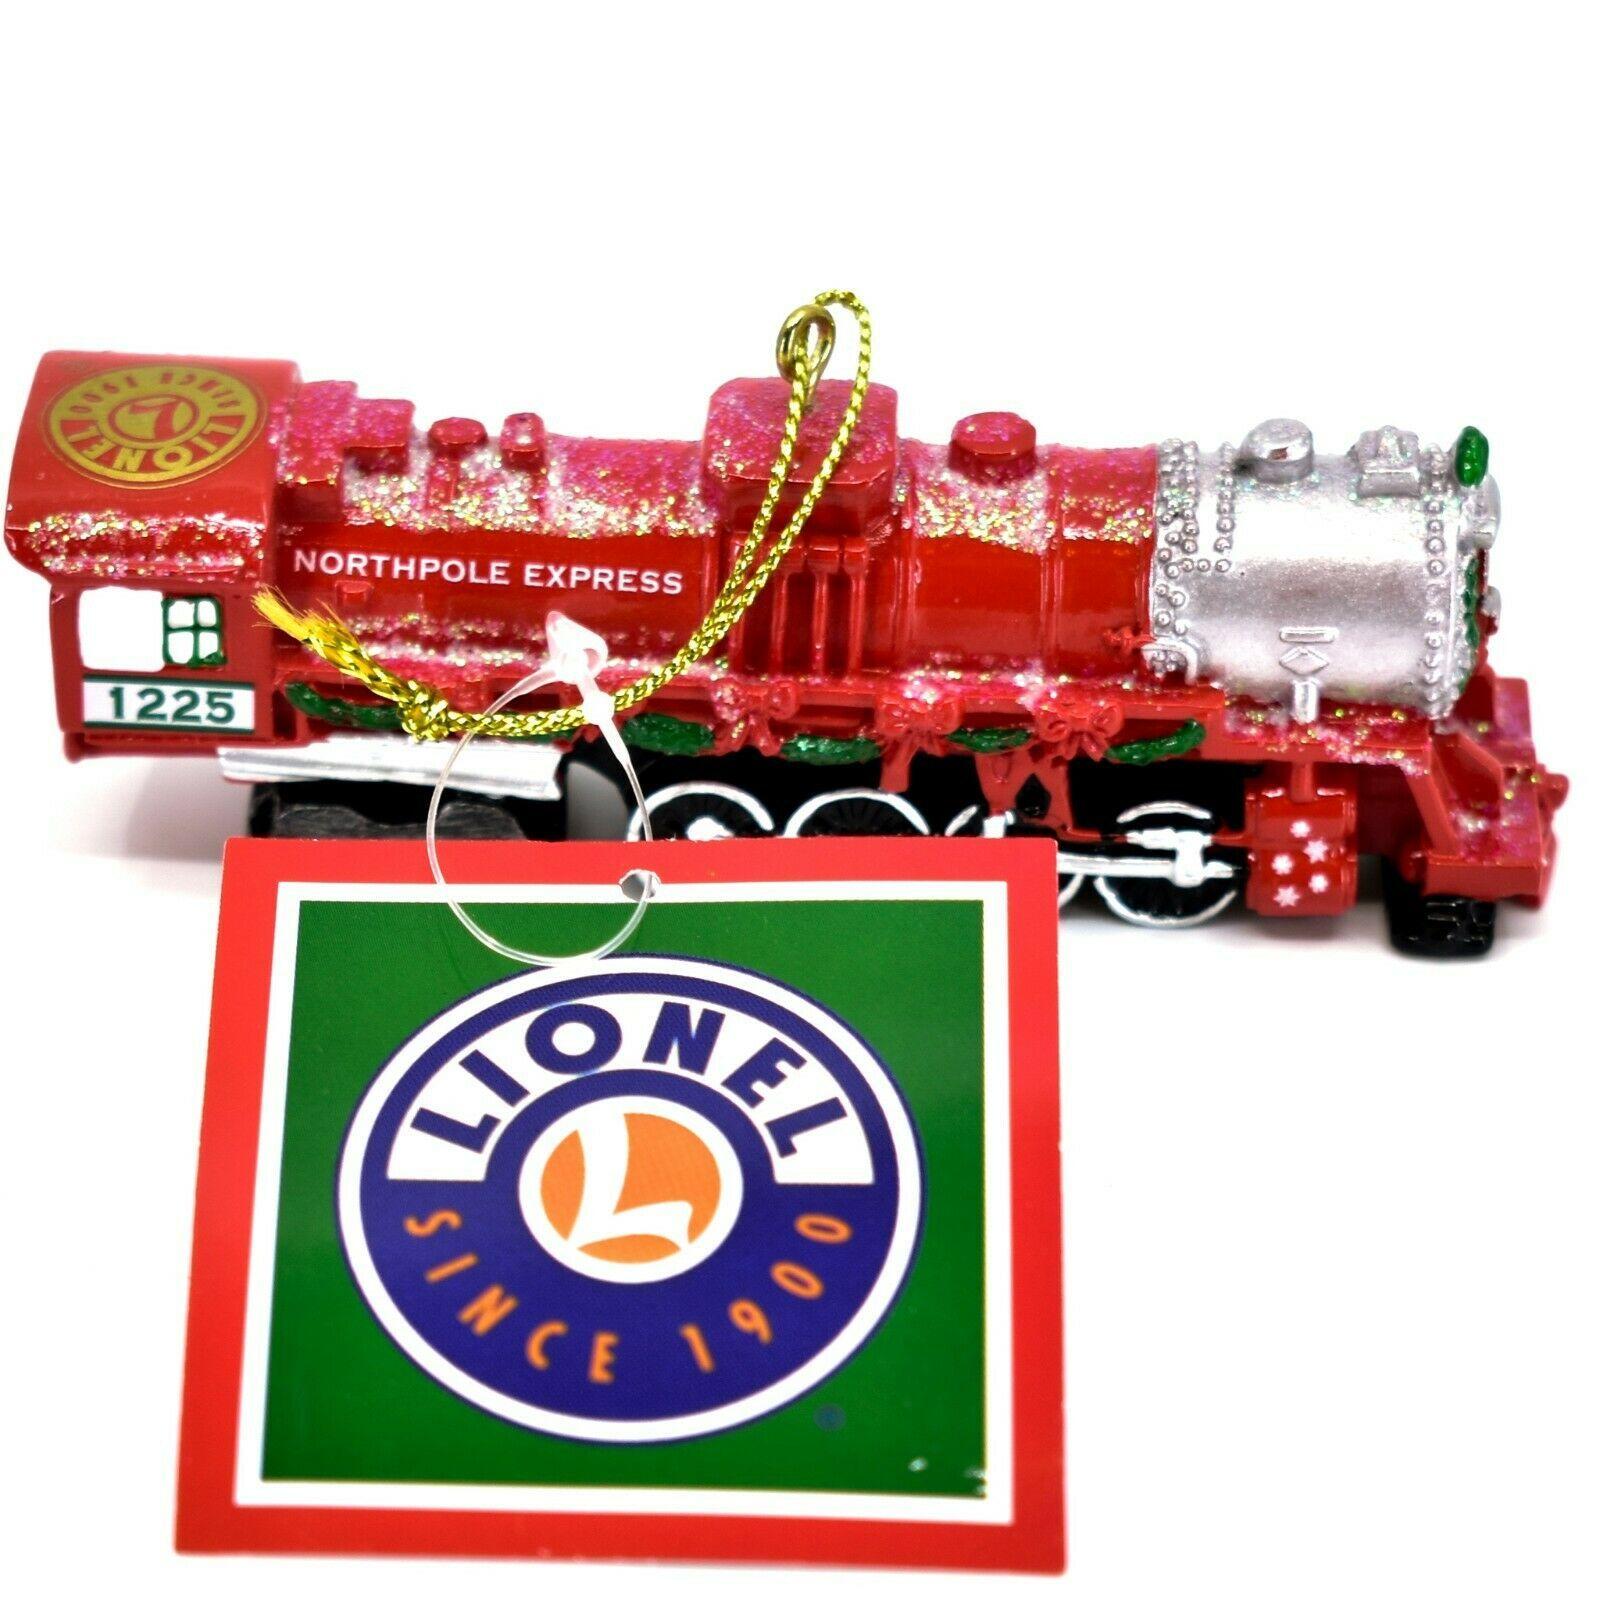 Kurt S. Adler Lionel Northpole Express 1225 Train Christmas Ornament